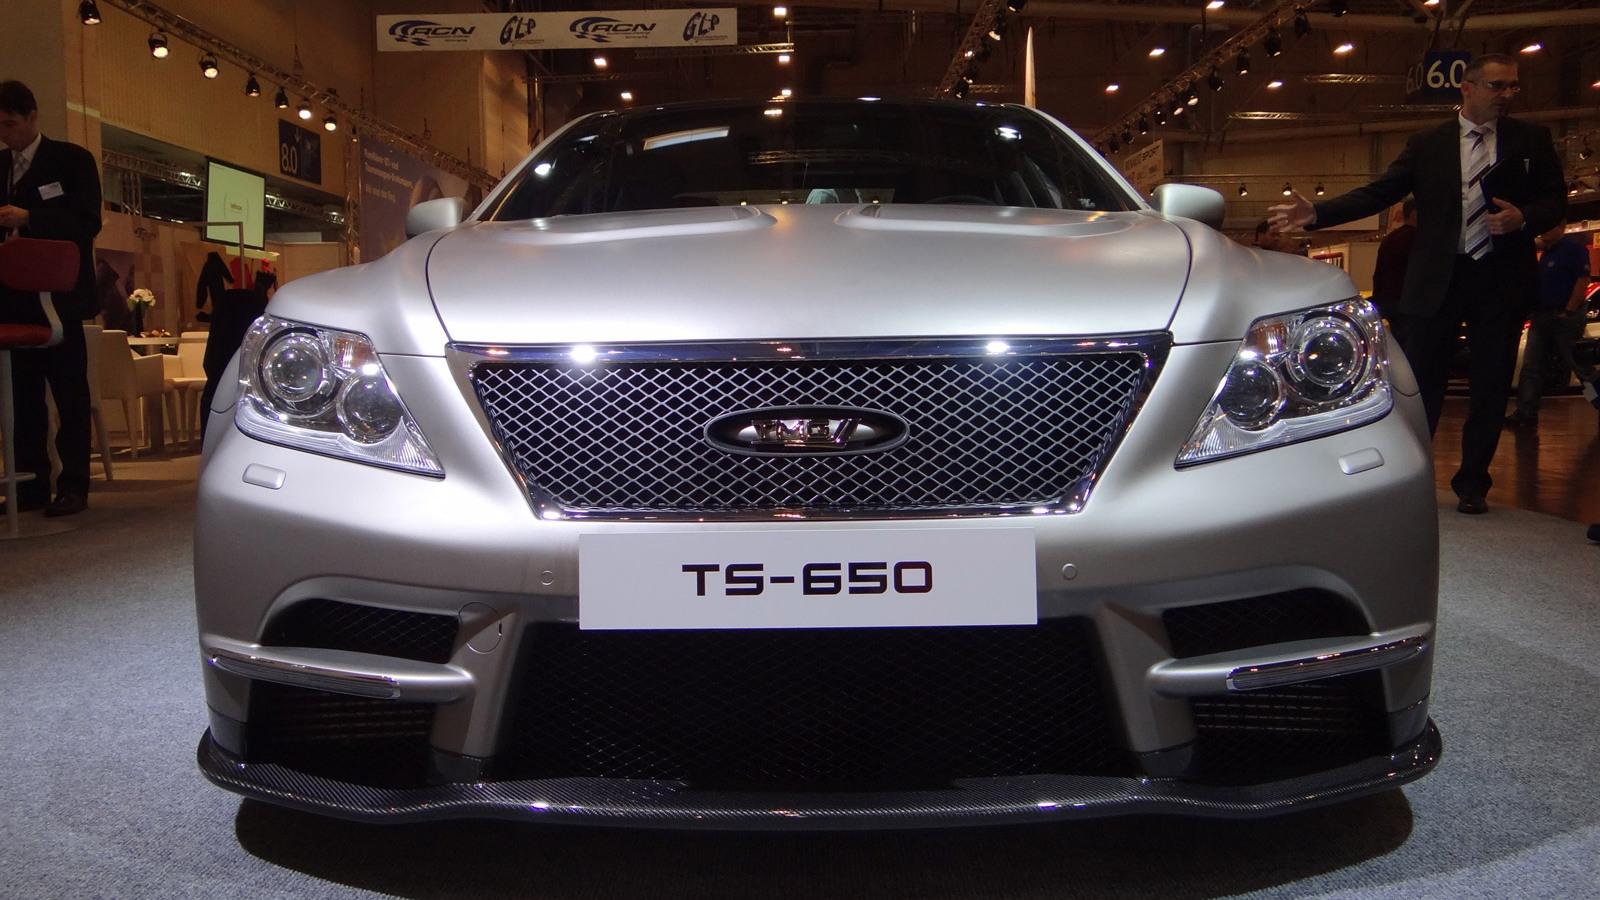 TMG Sports 650 concept, 2012 Essen Motor Show